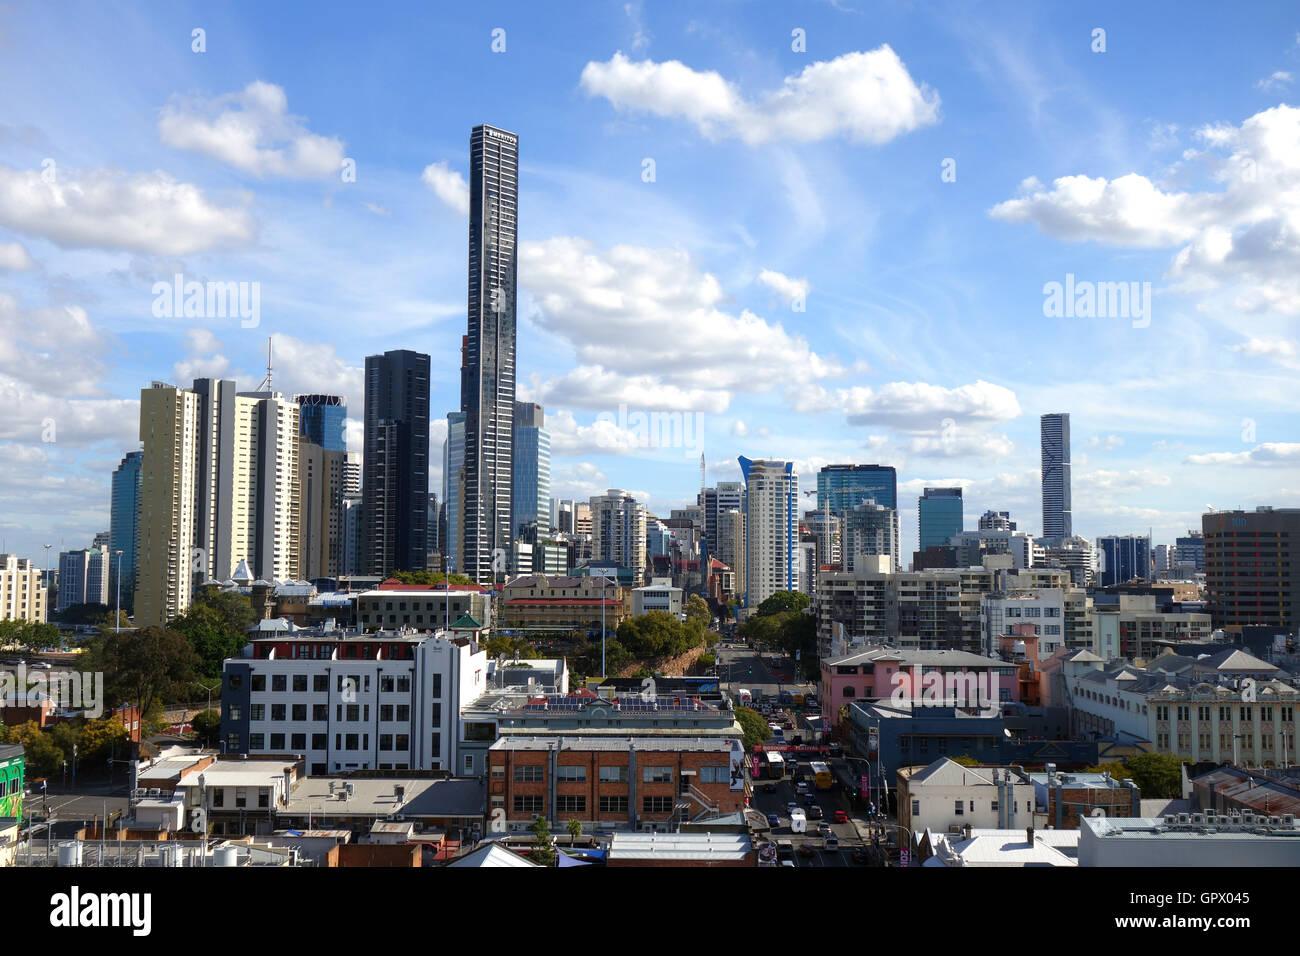 View along Ann Street through Fortitude Valley towards Brisbane CBD, Queensland, Australia. No MR or PR - Stock Image